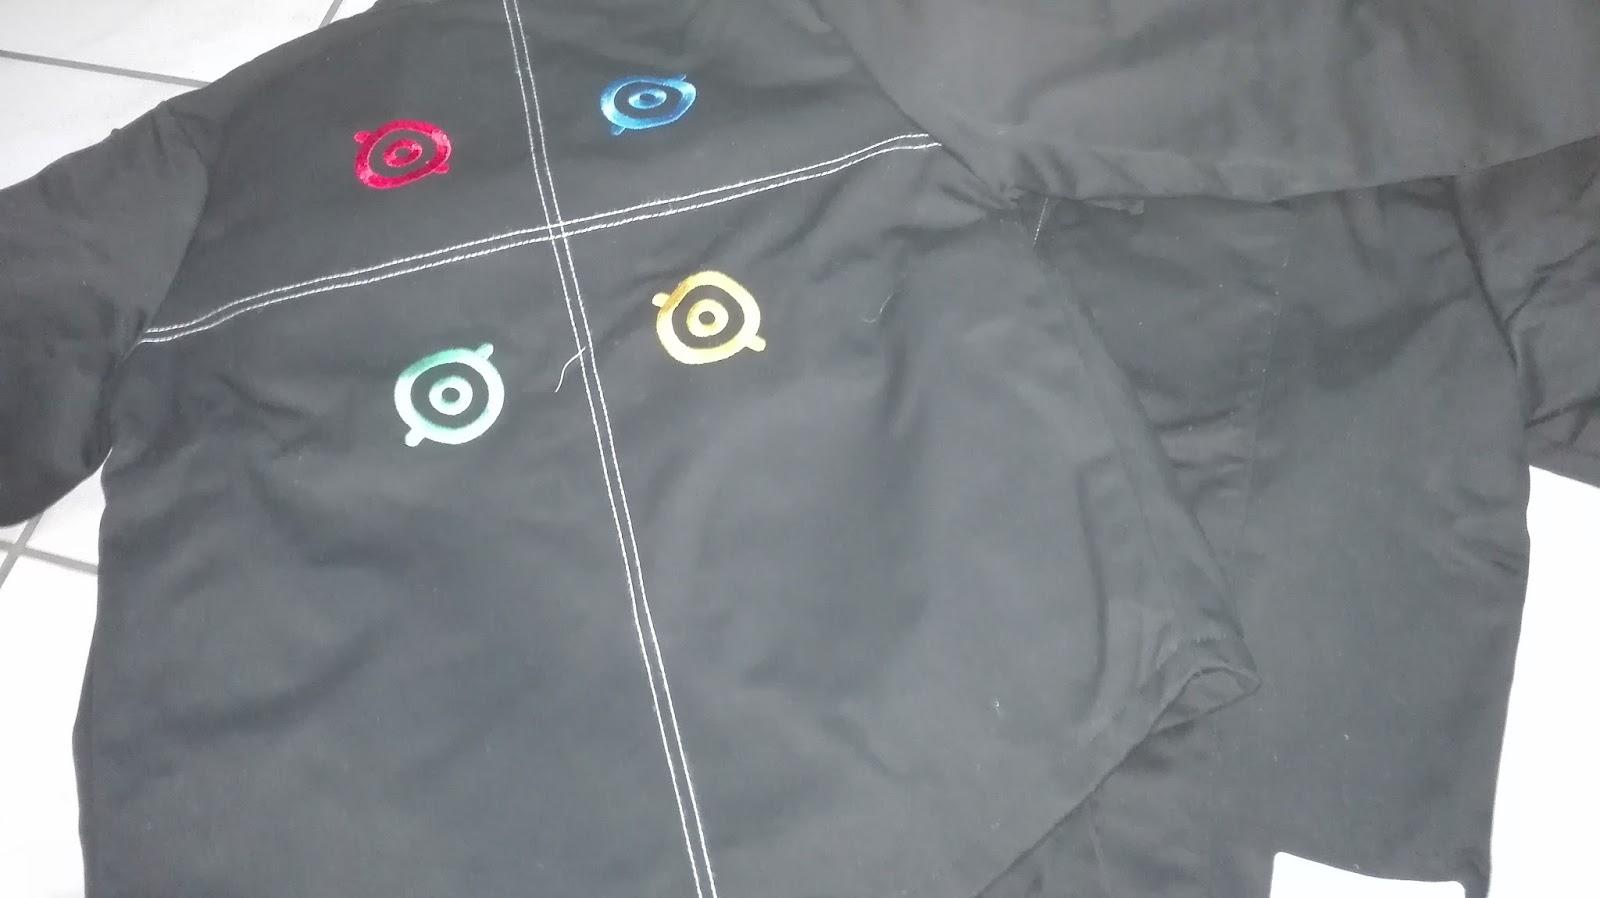 cercle escrime mutzig molsheim 12 vestes kits d 39 initiation premi res touches. Black Bedroom Furniture Sets. Home Design Ideas